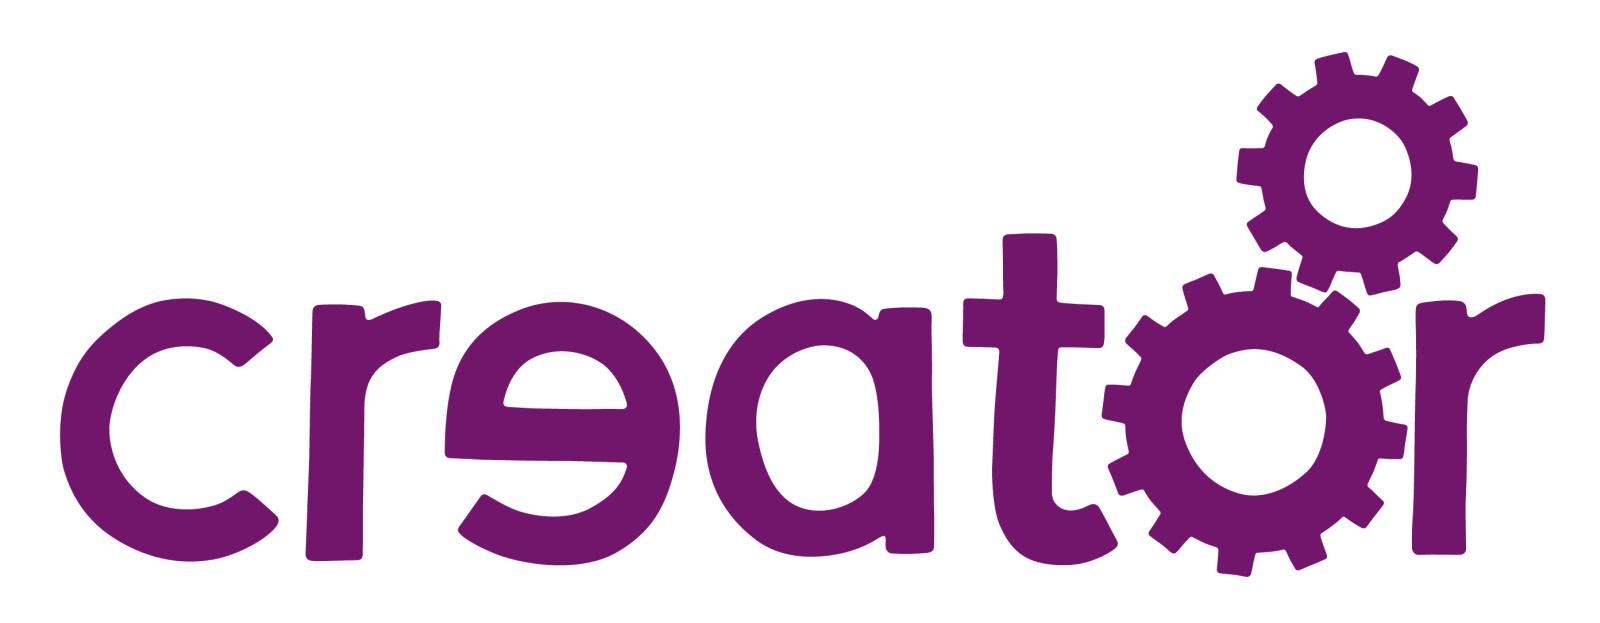 Creator_logo_RGB_purple